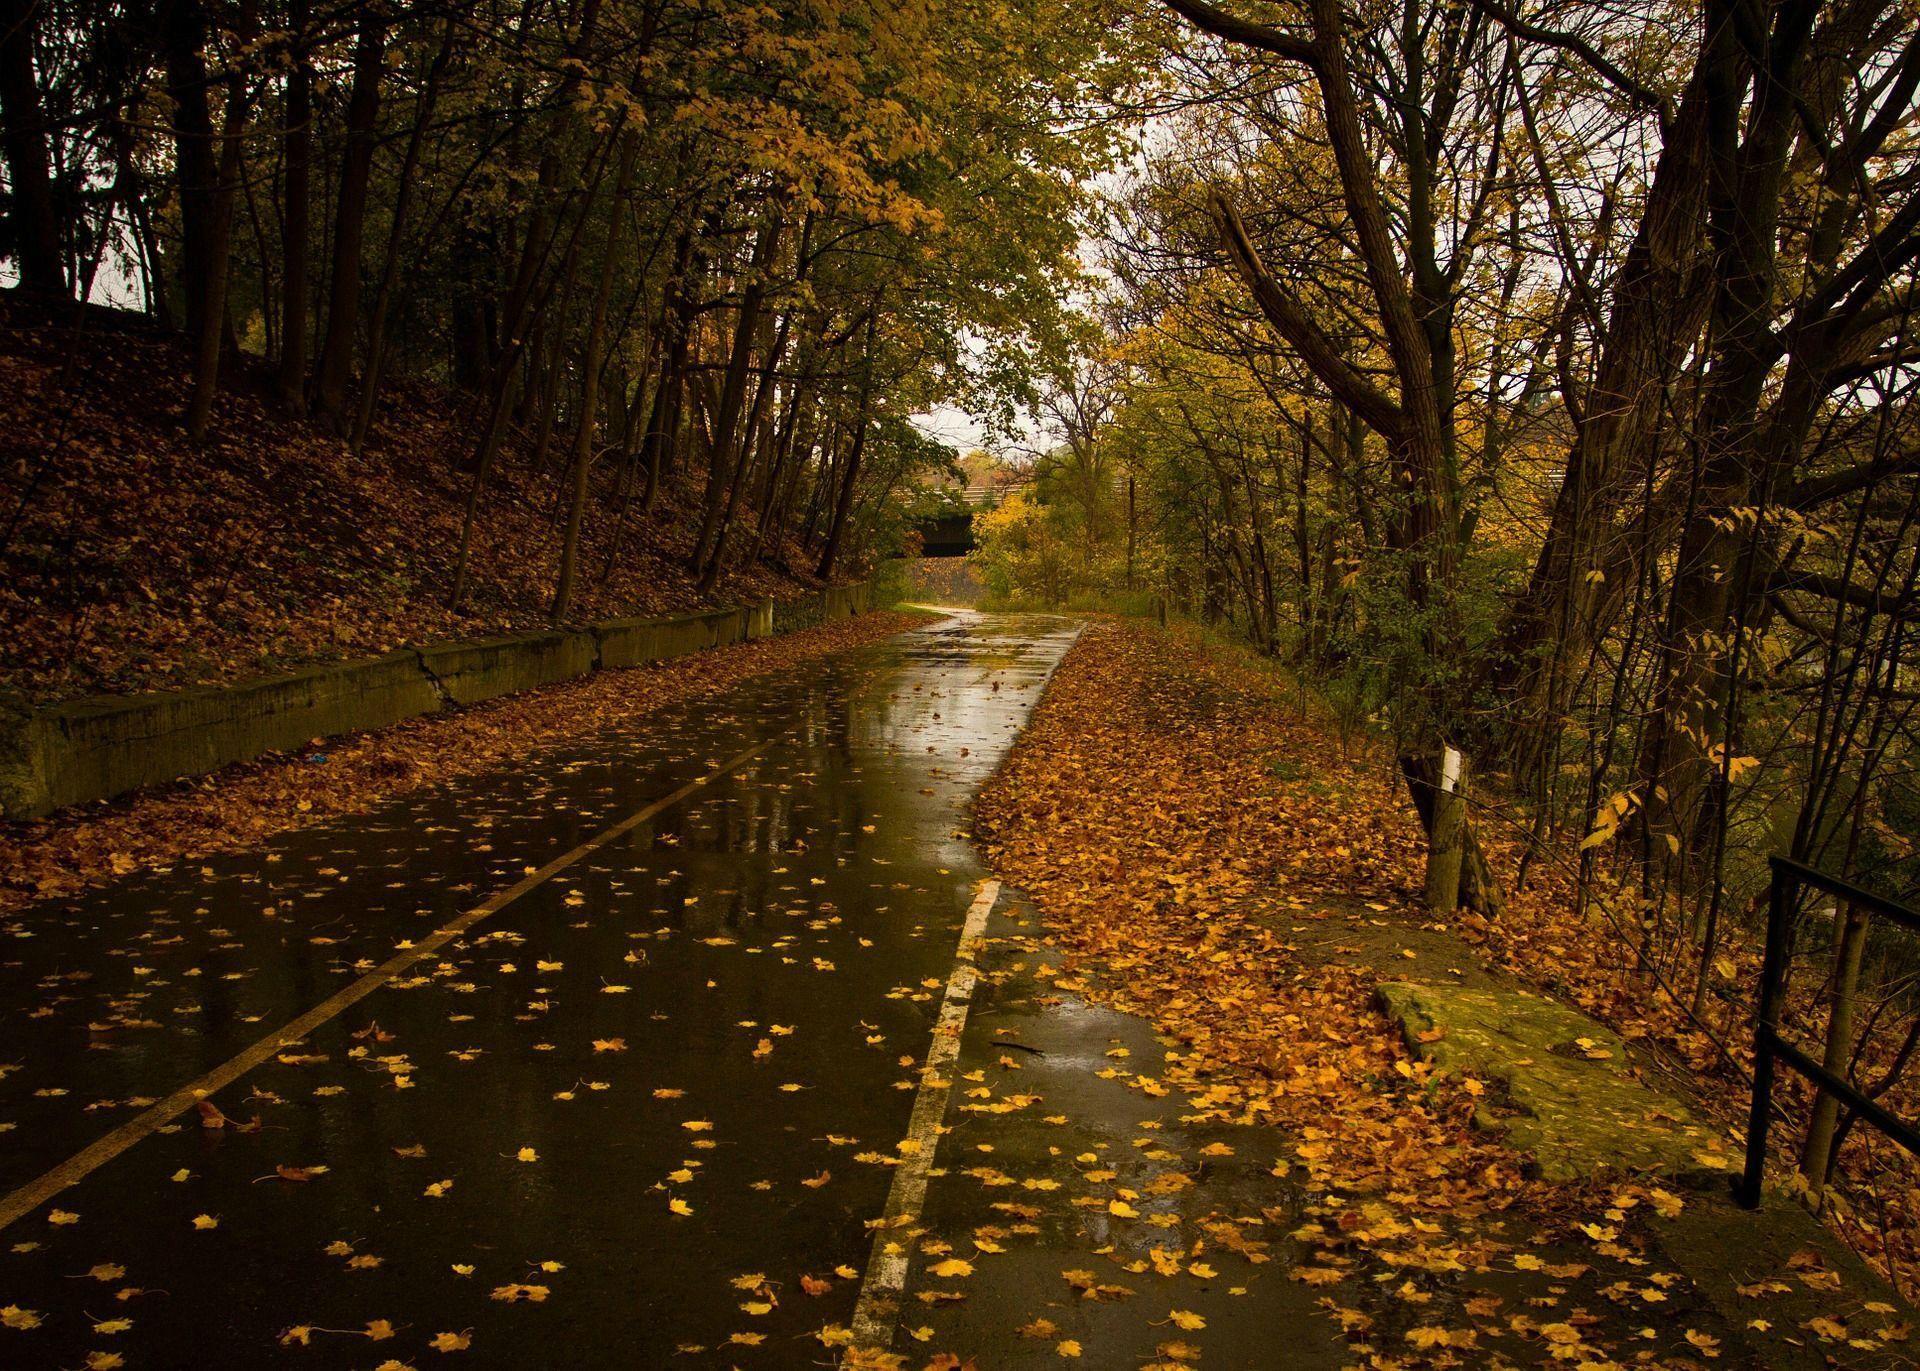 Rainy Fall Wallpapers Top Free Rainy Fall Backgrounds